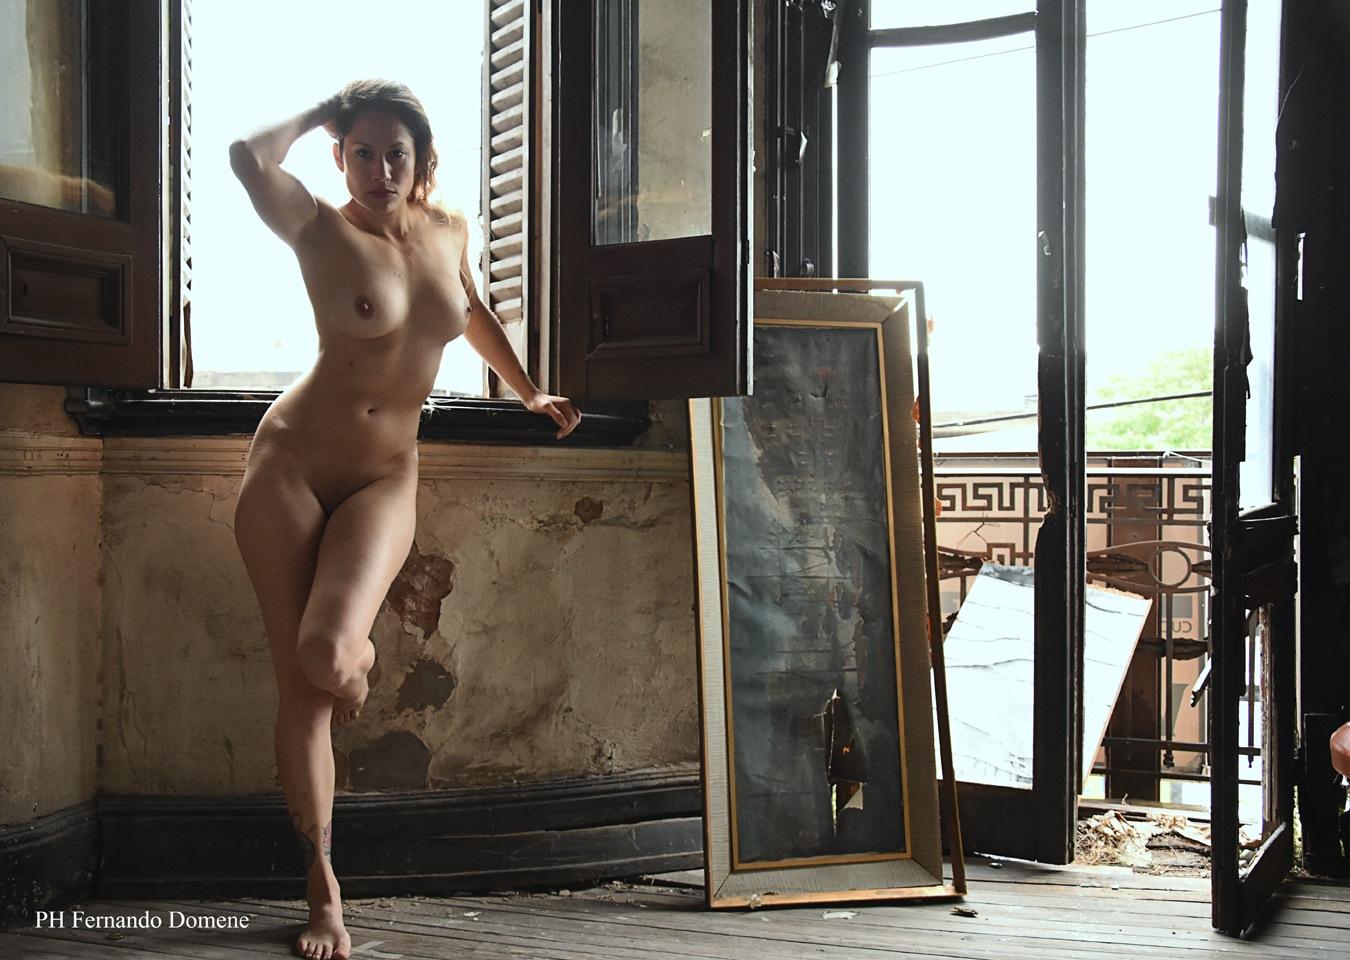 Mirame by Fernando Domene